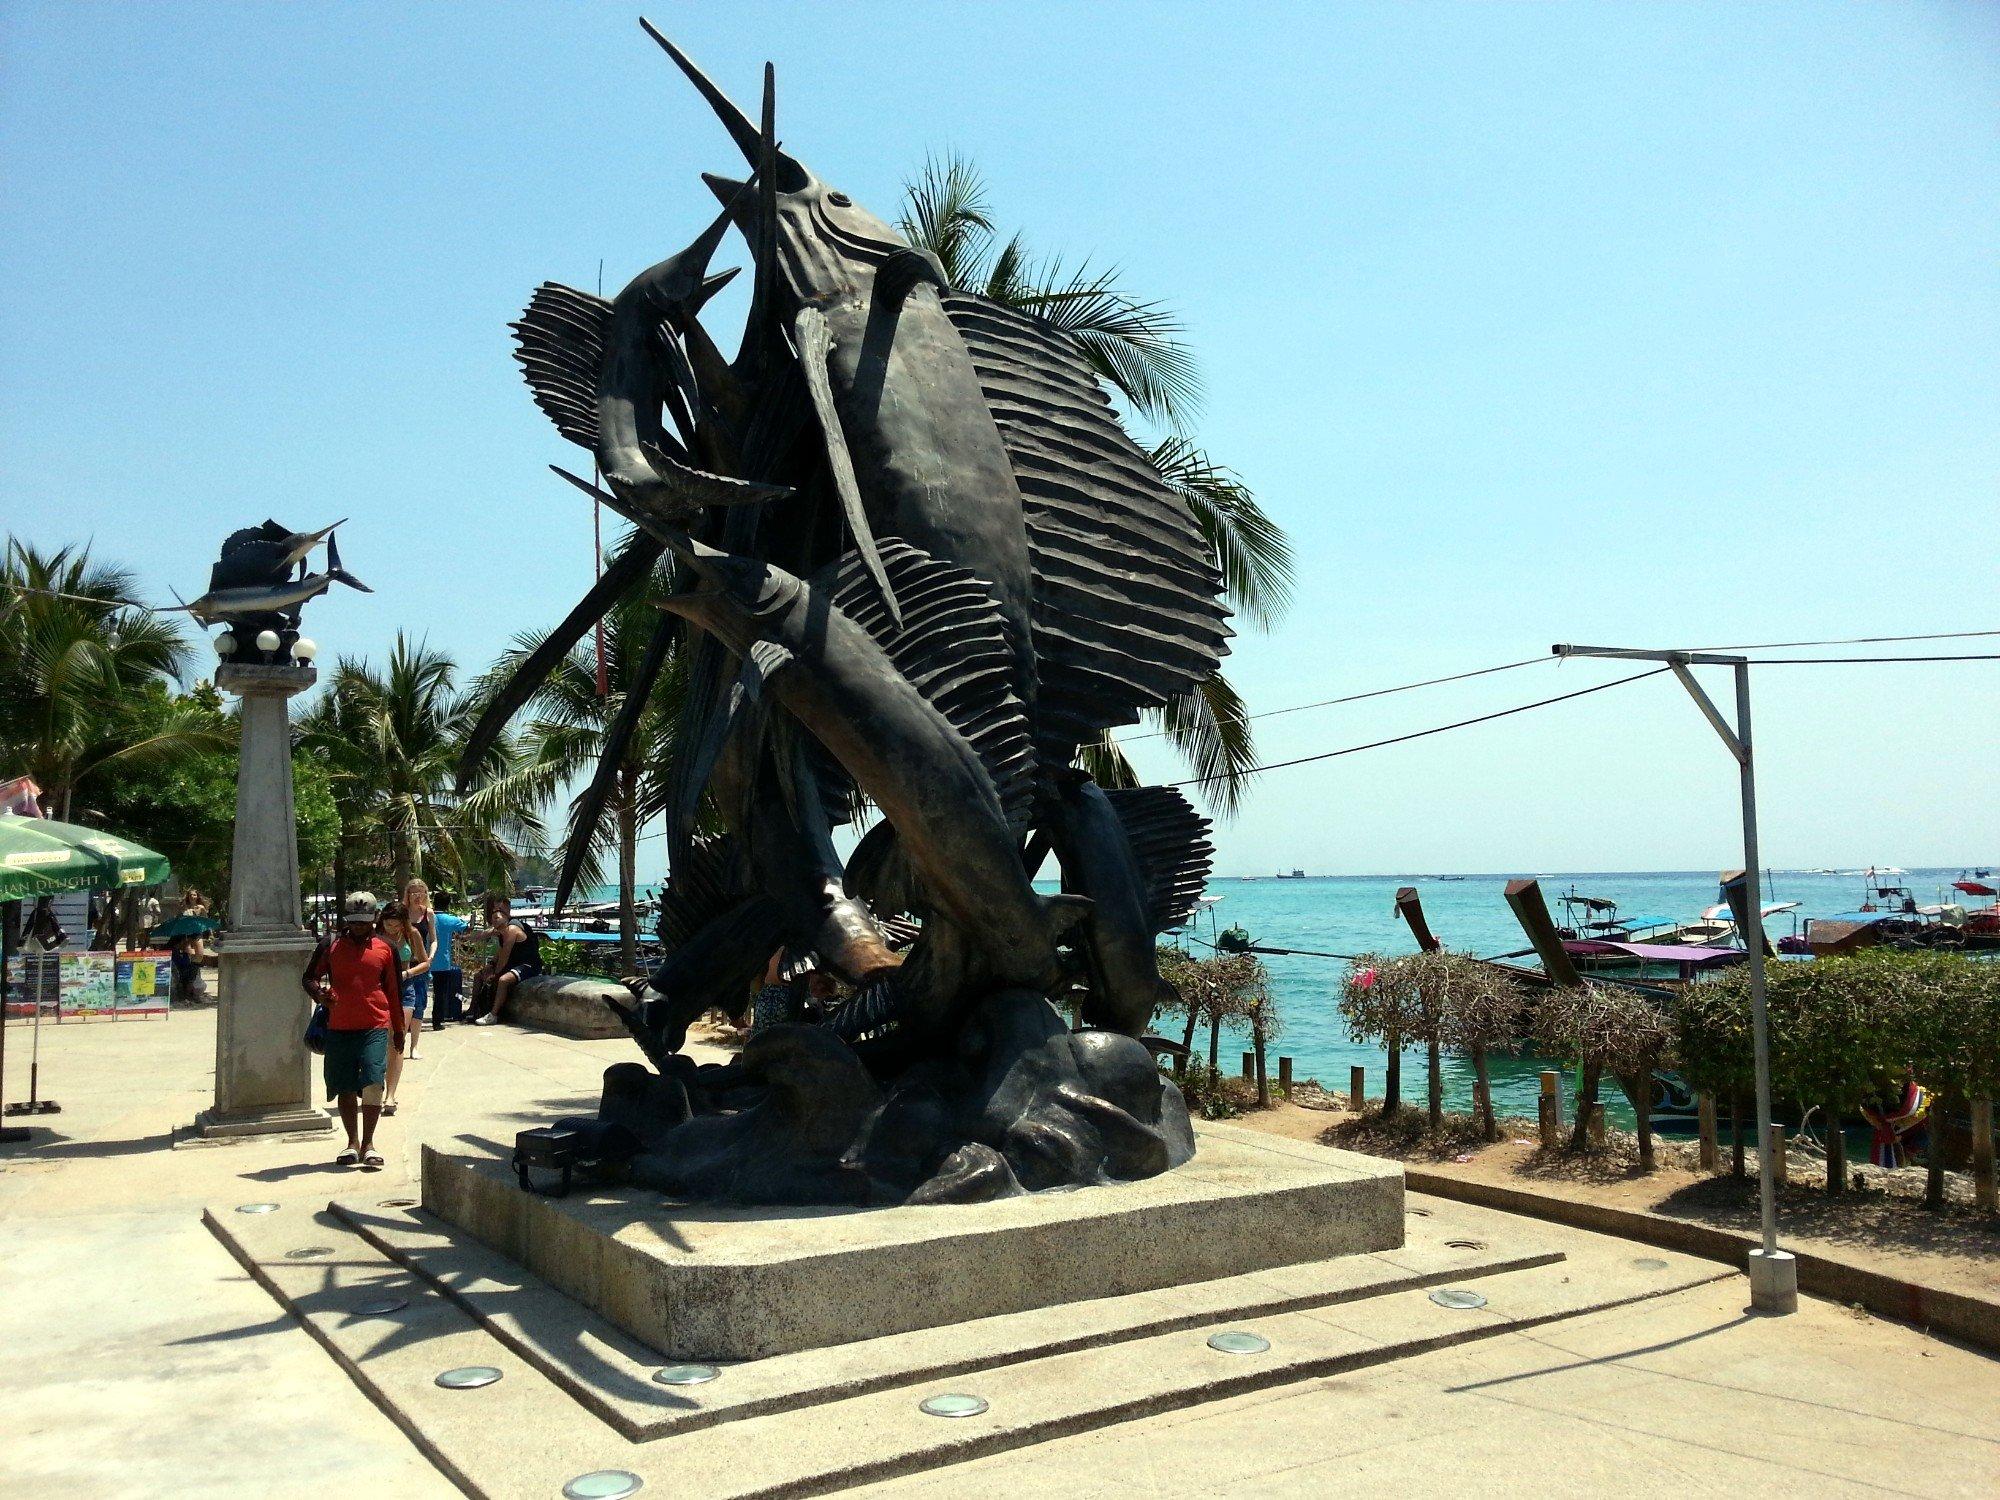 Sail fish sculpture on Tonsai Bay